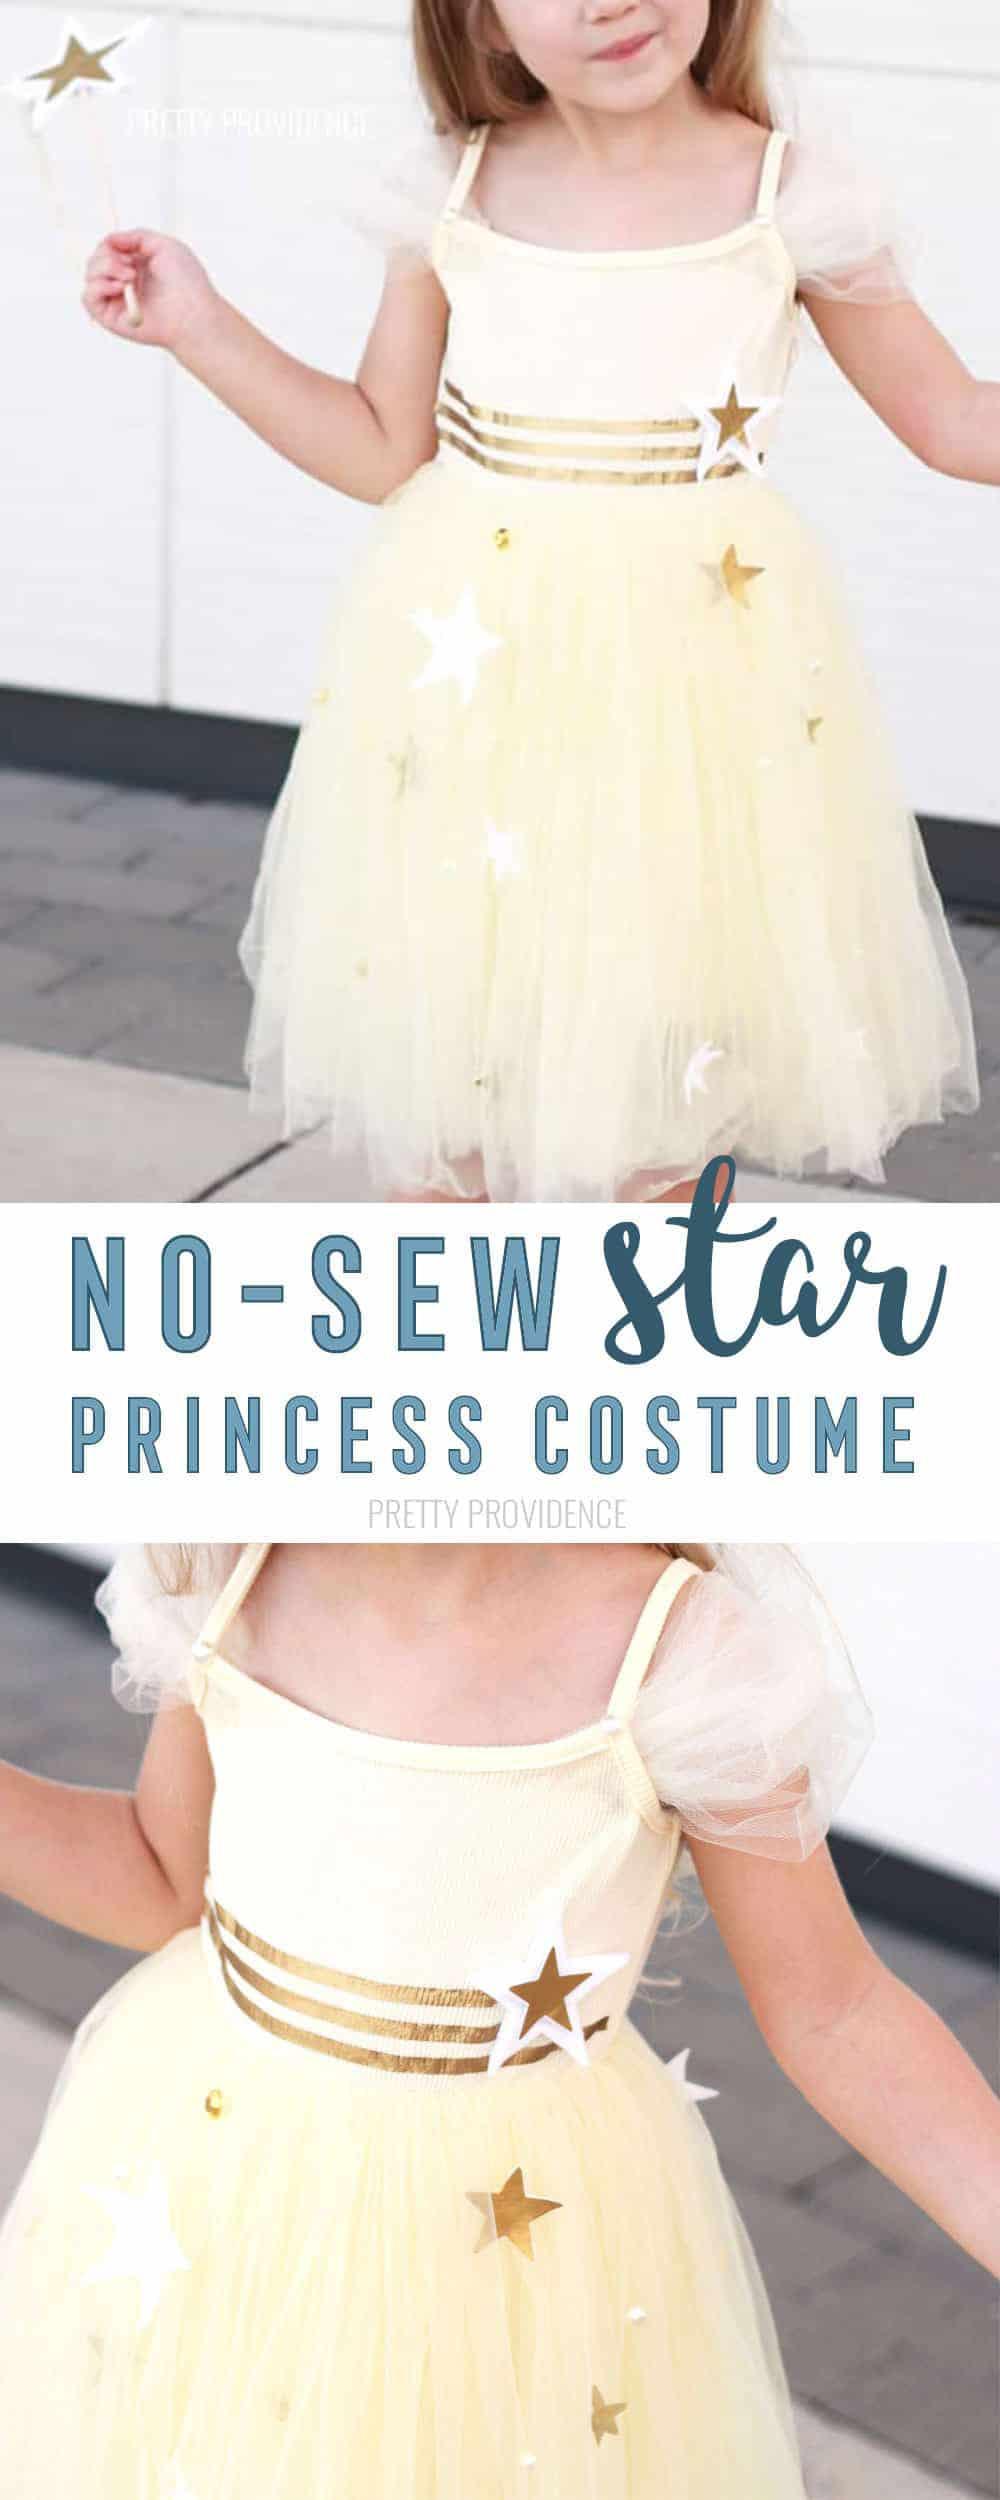 DIY Star Princess Costume! No Sew Princess Costumes for Halloween or Princess Camp!